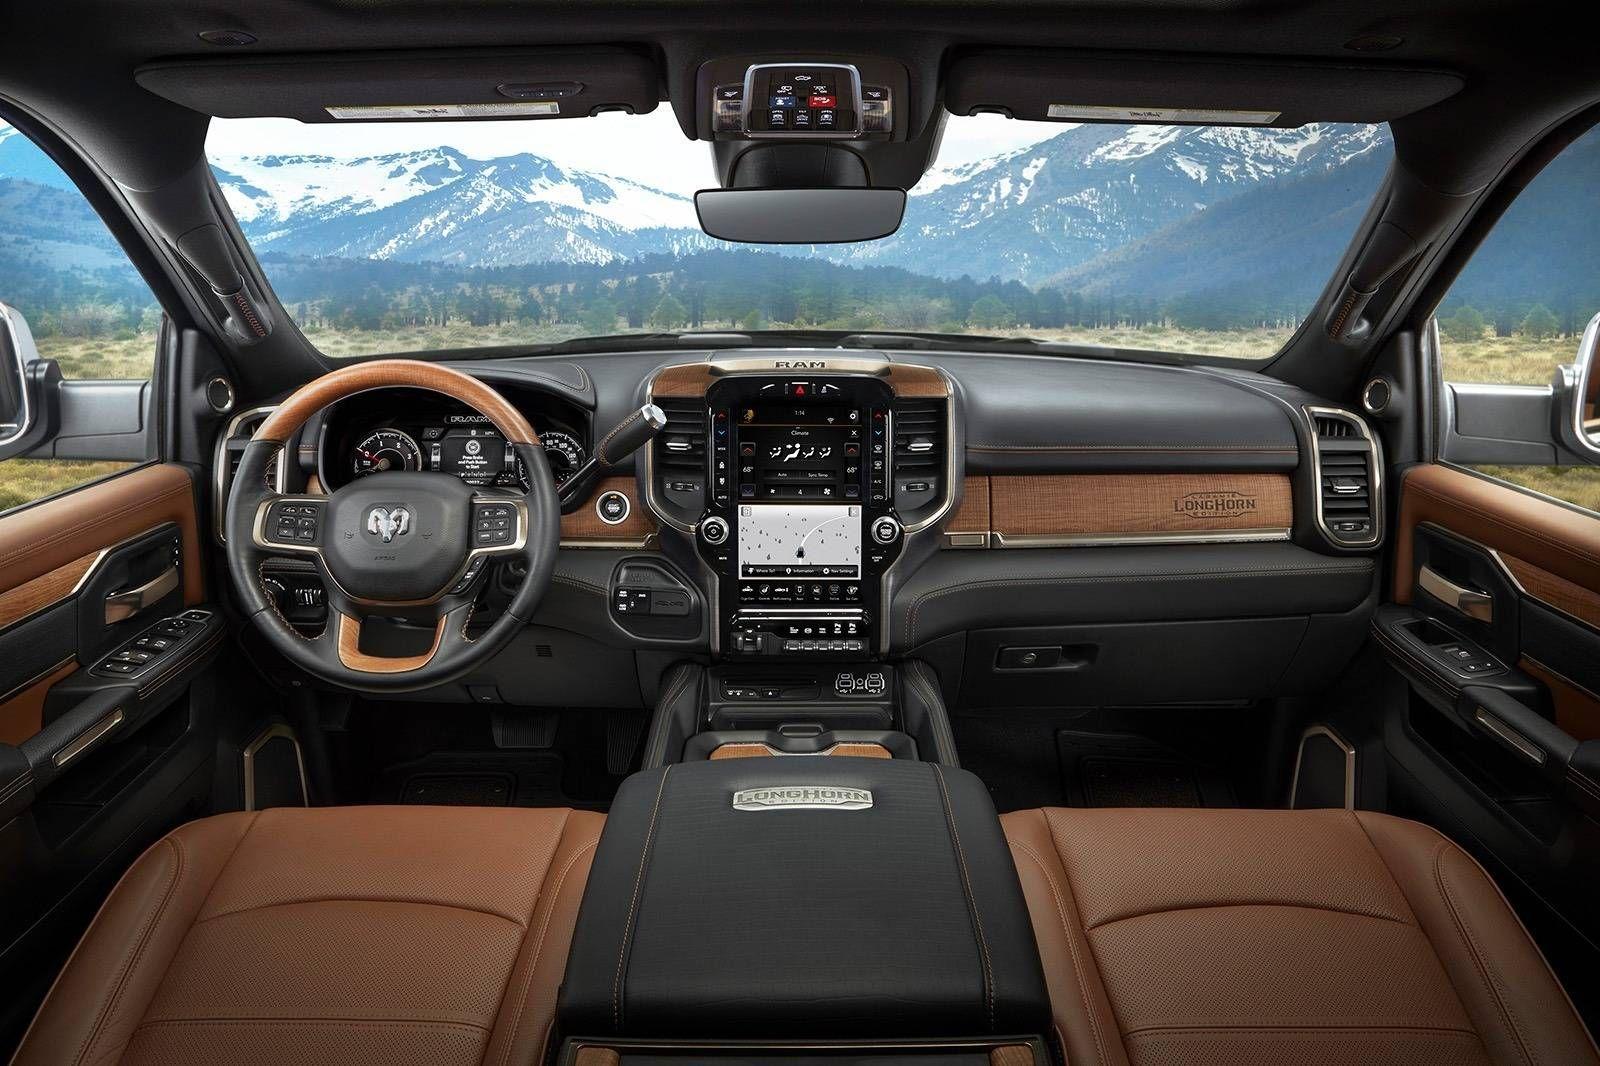 Ram Dodge 3500 Limited 2019 Google Search Dodge Ram Longhorn Truck Interior Dodge Ram